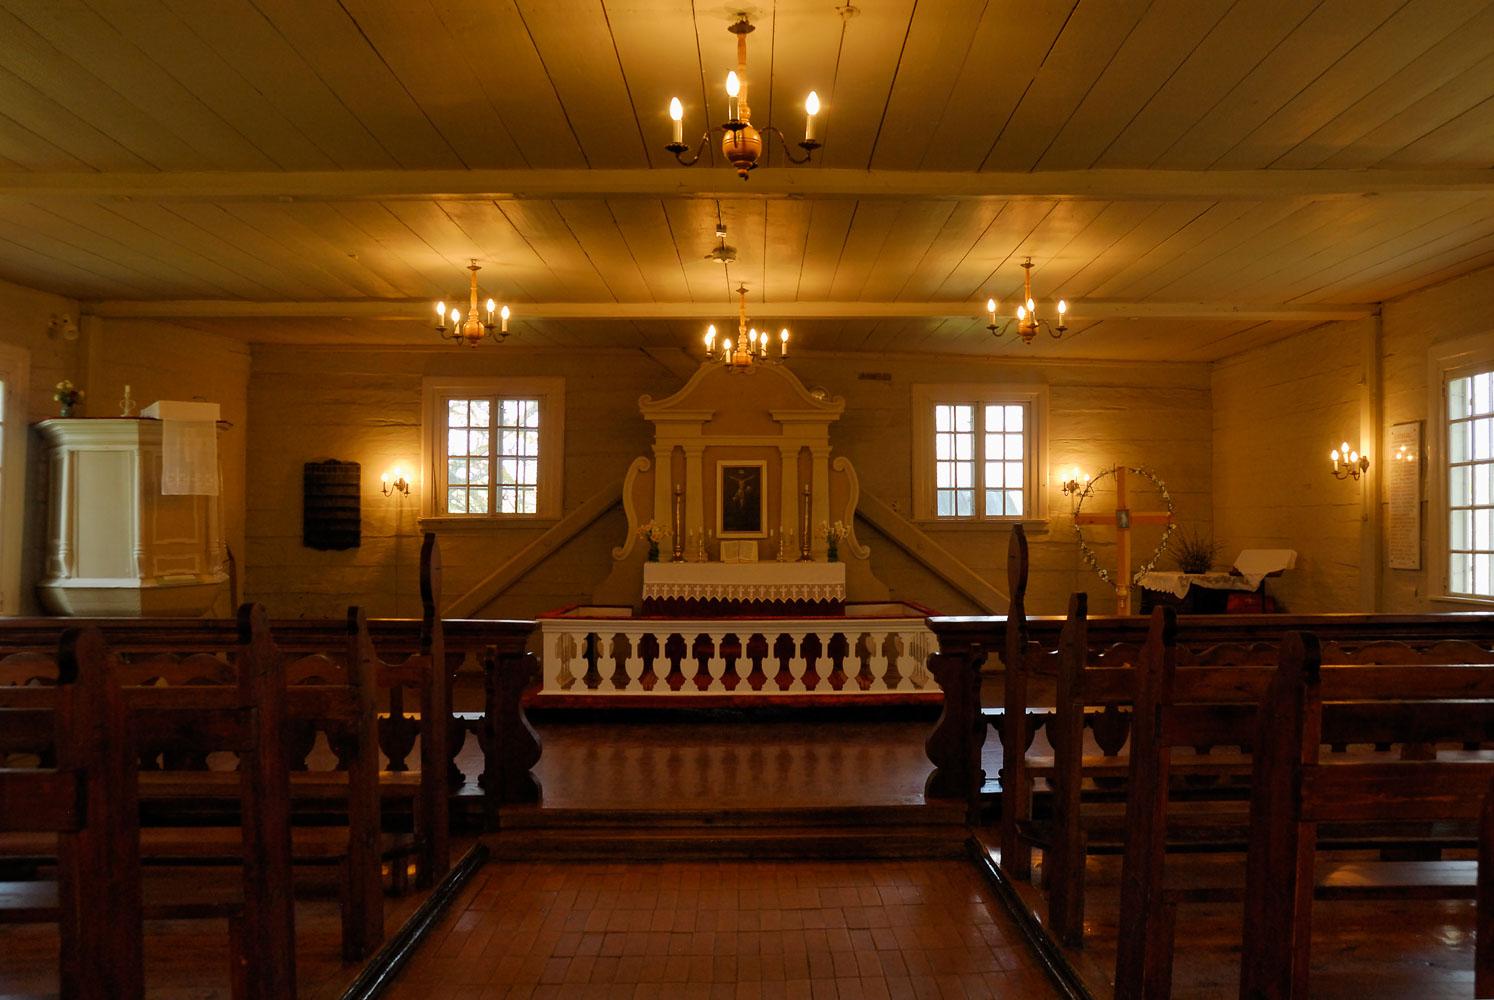 LE080506-Turaida---Interior-of-the-wooden-church.jpg